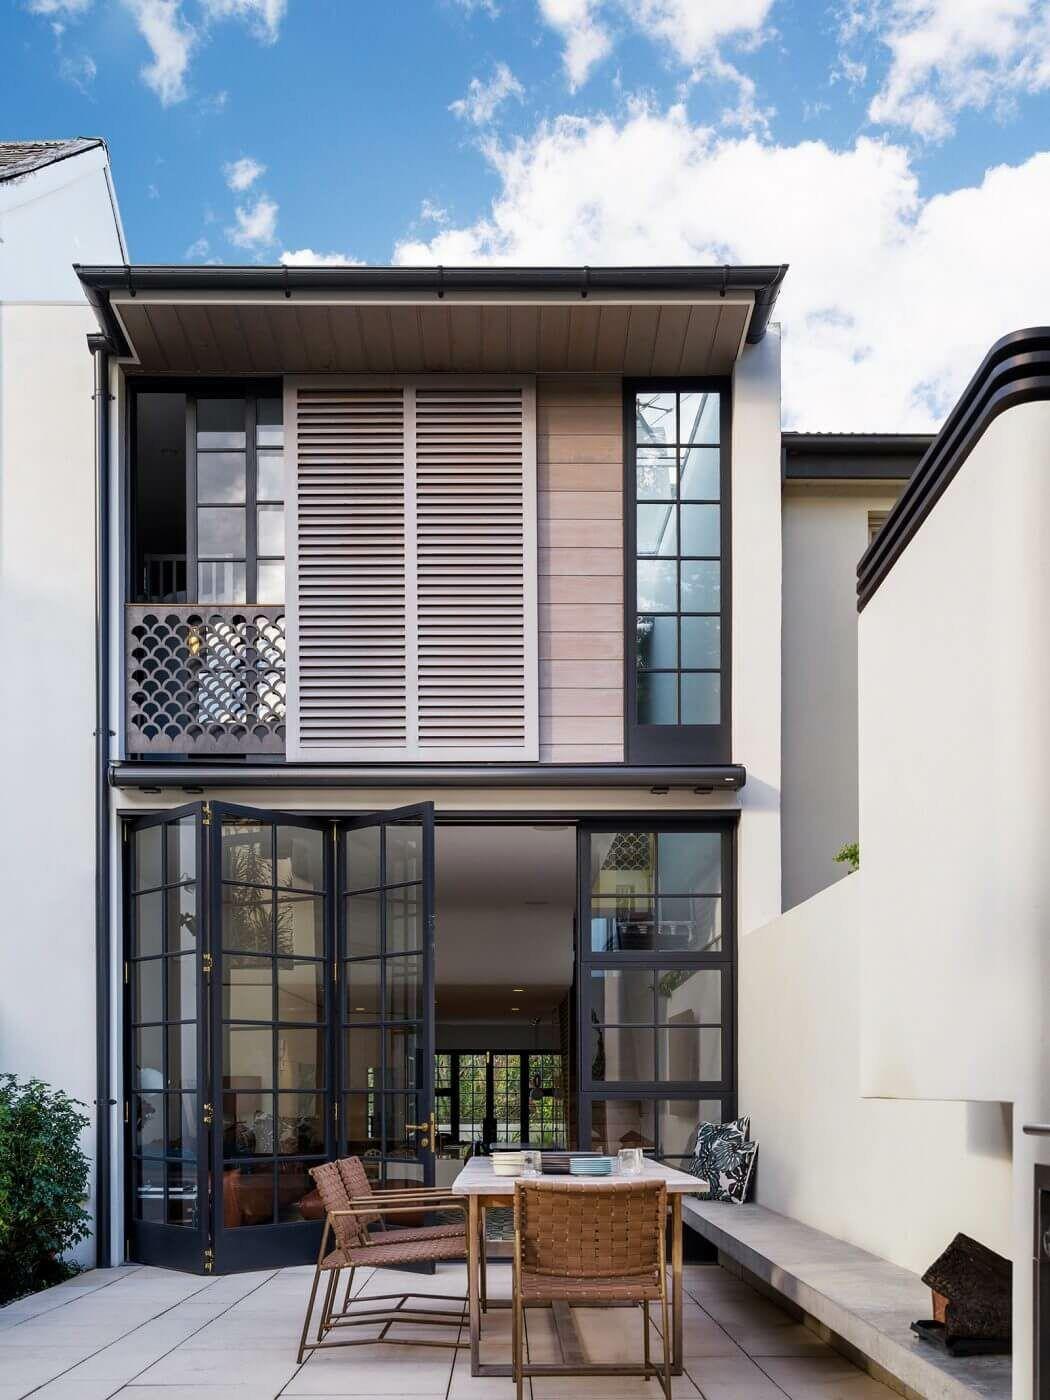 luigi-rosselli-architects-directors-cut-on-architecture-005-1050x1400-9453801